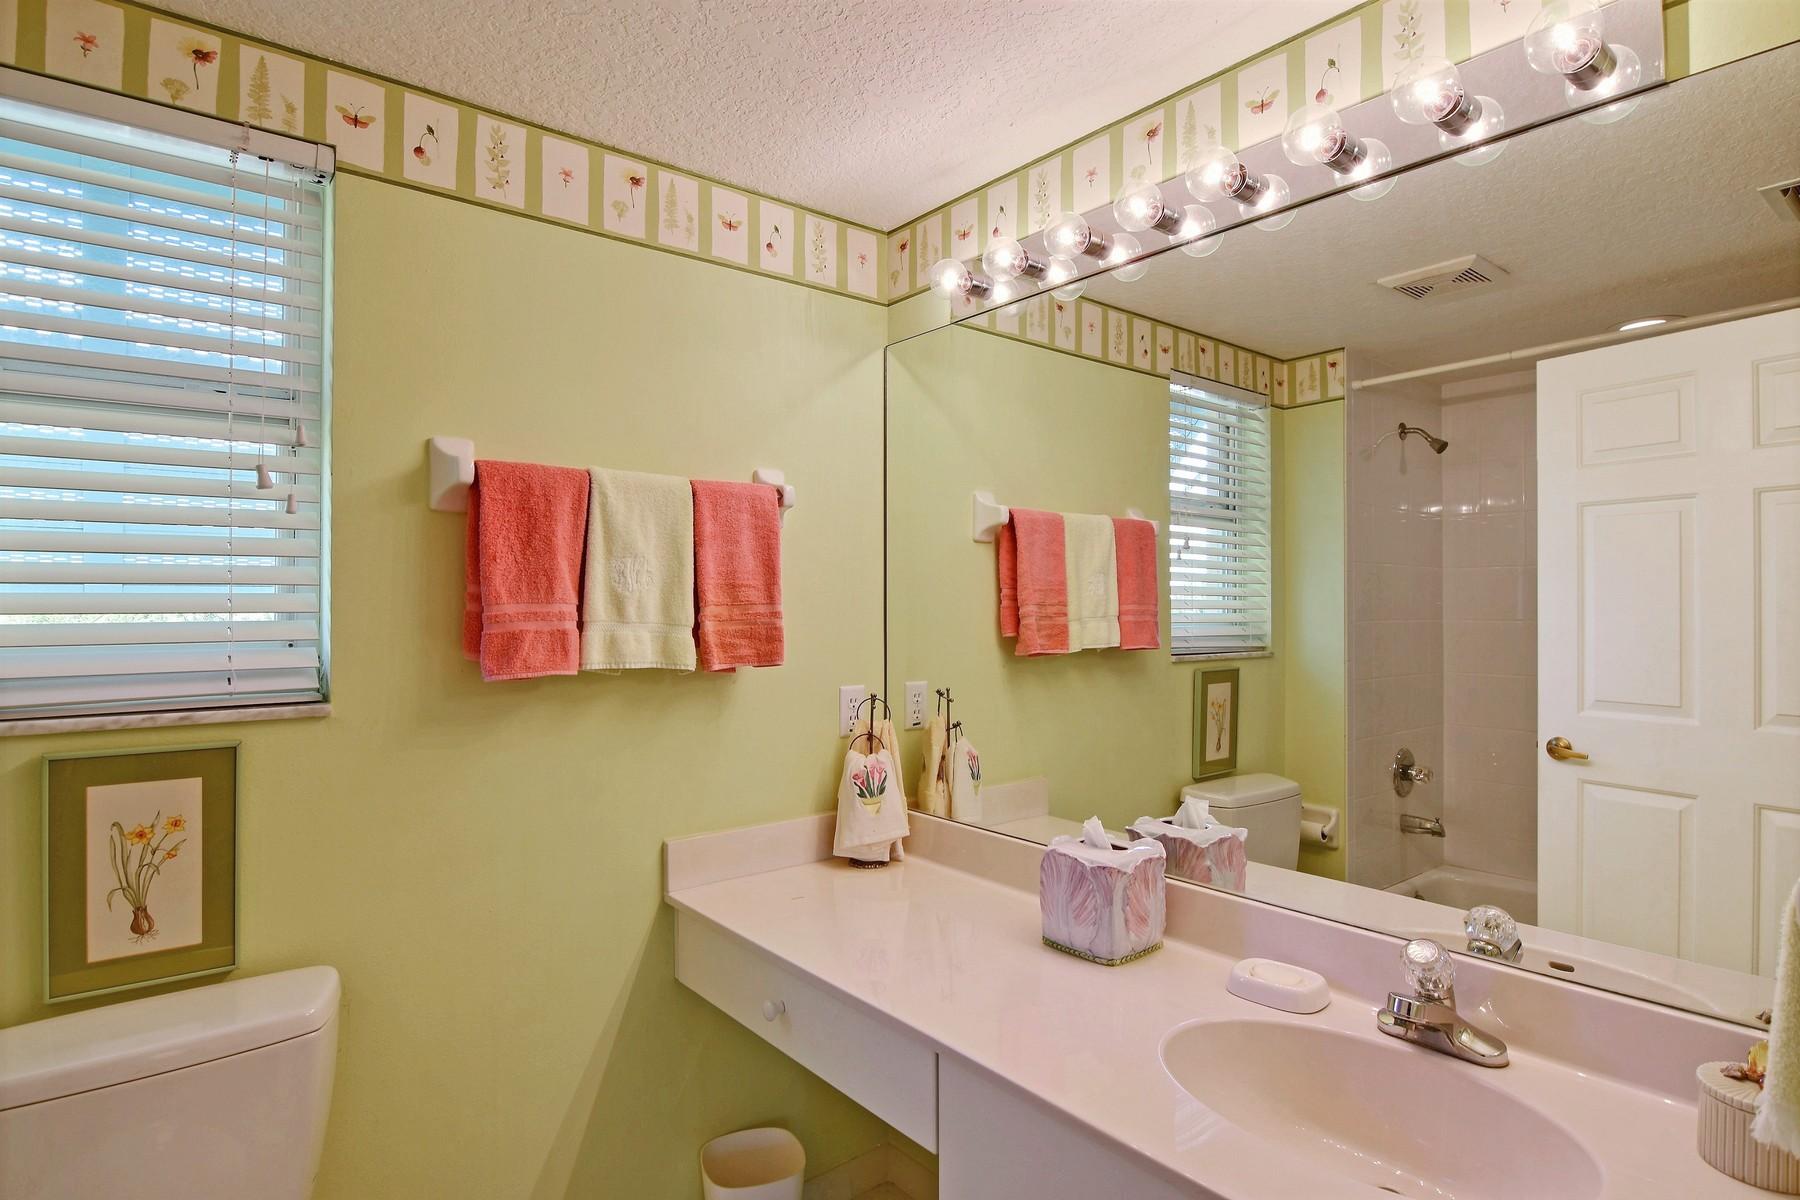 Additional photo for property listing at Sea Oaks Beach Villa 8814 S Sea Oaks Way Unit 304 Vero Beach, Florida 32963 United States